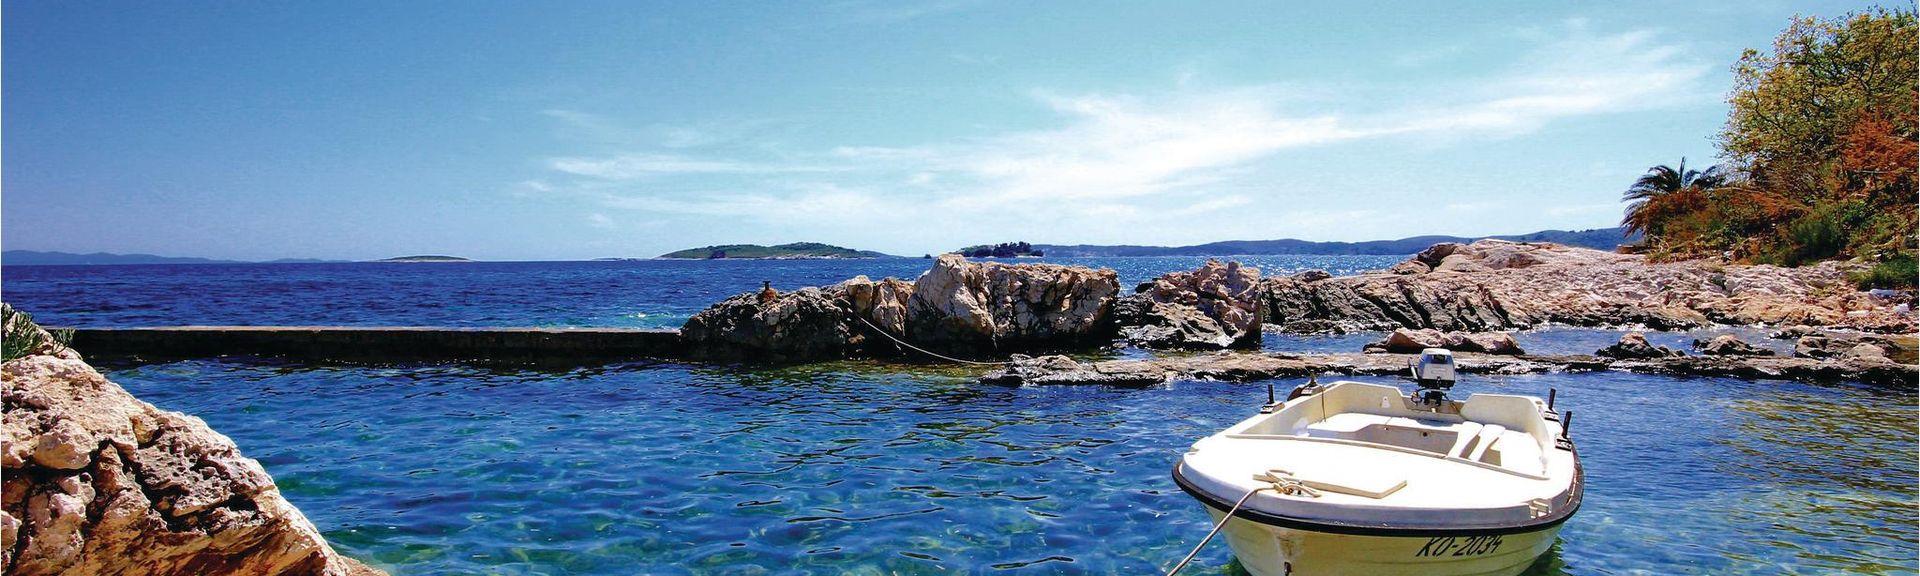 Trpanj, Dubrovnik-Neretva, Kroatië